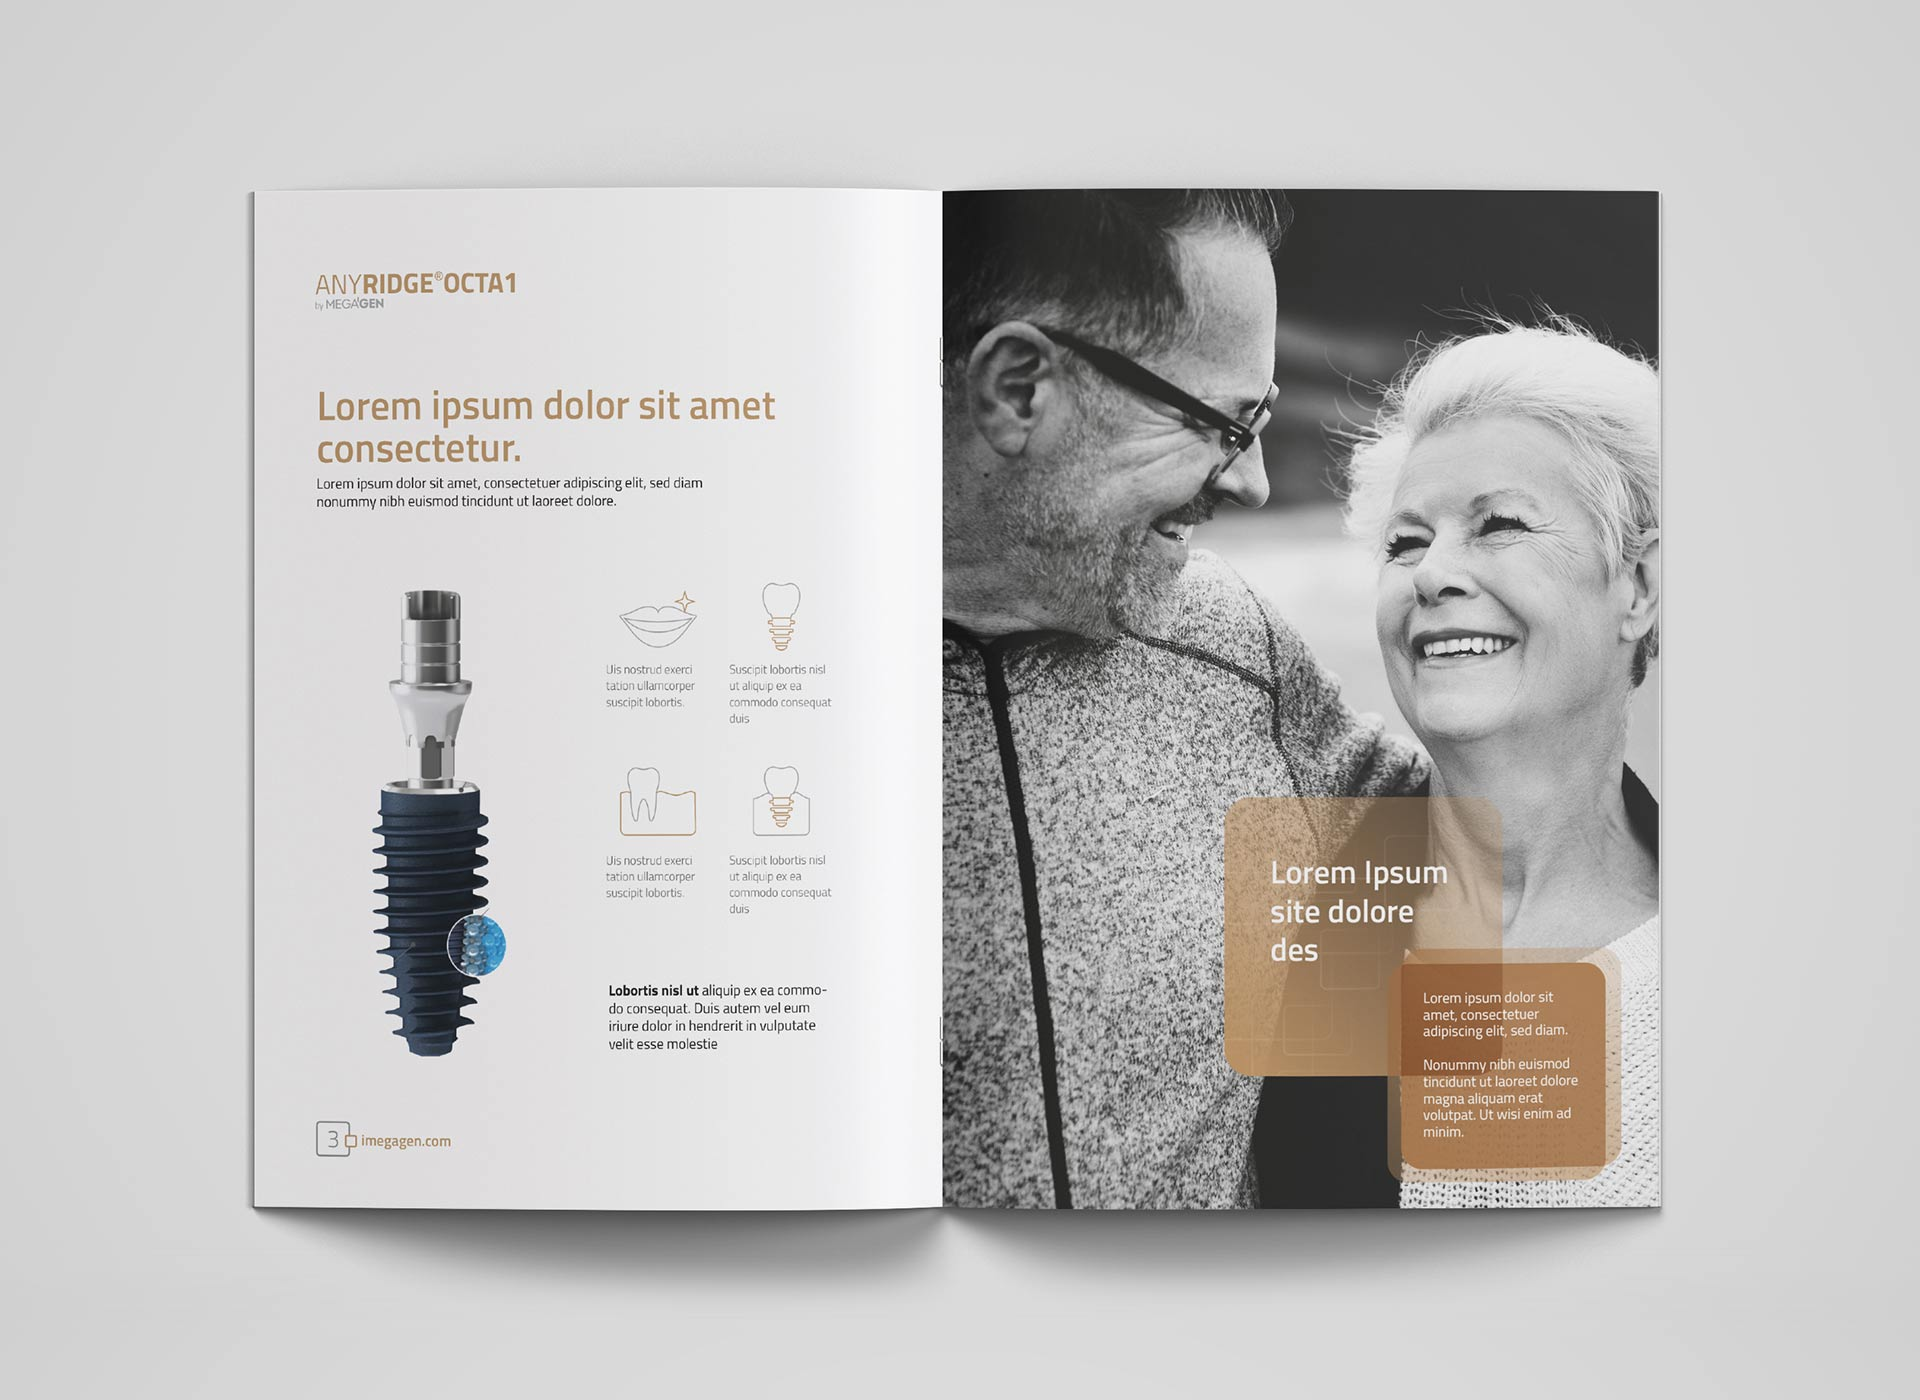 Megagen Koreea anyridge octa1 brochure portfolio inoveo